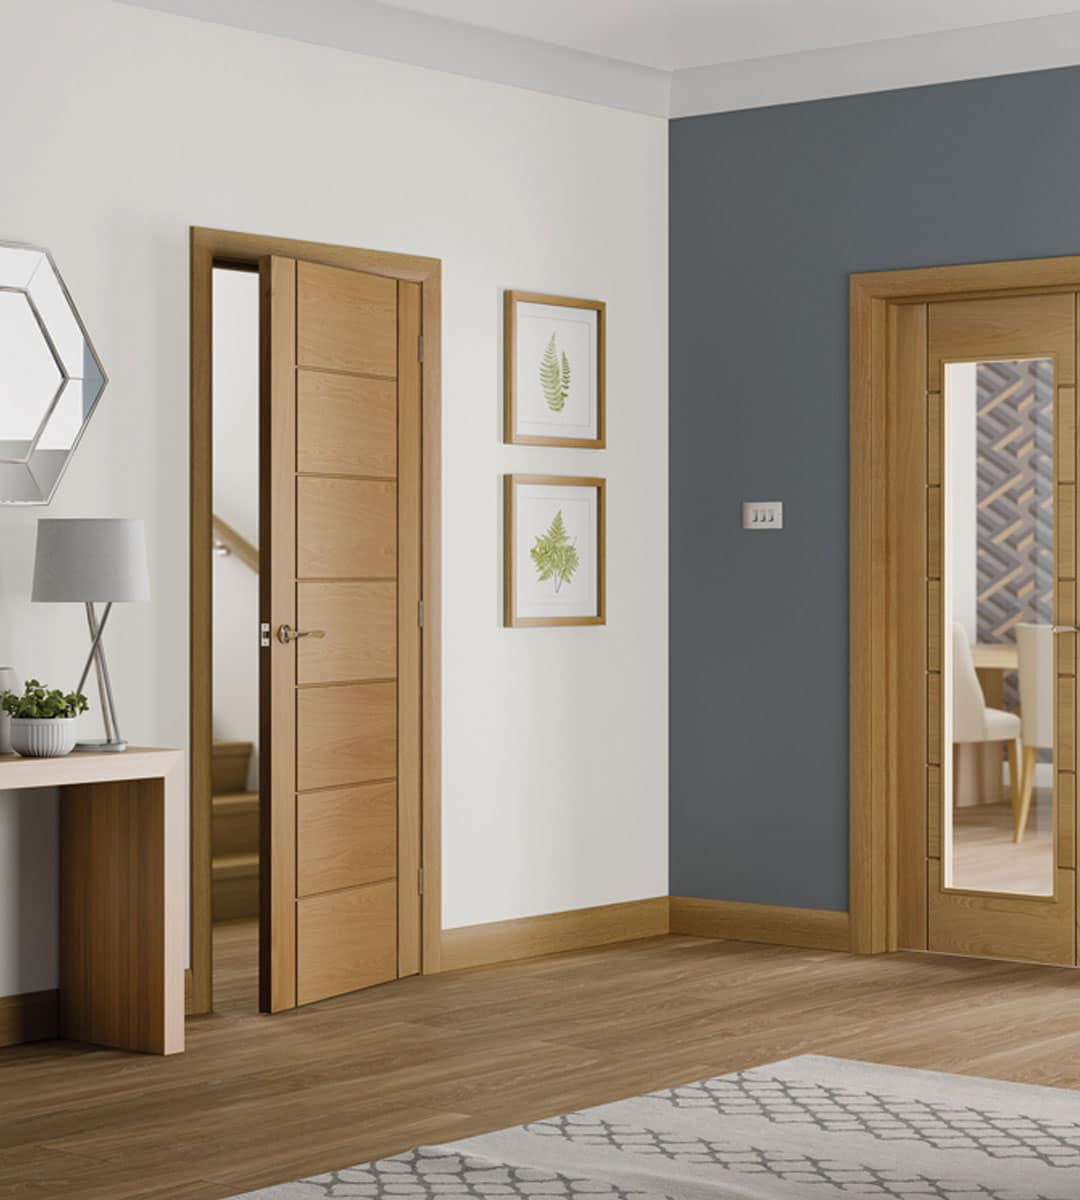 palermo fire door shawfield doors. Black Bedroom Furniture Sets. Home Design Ideas